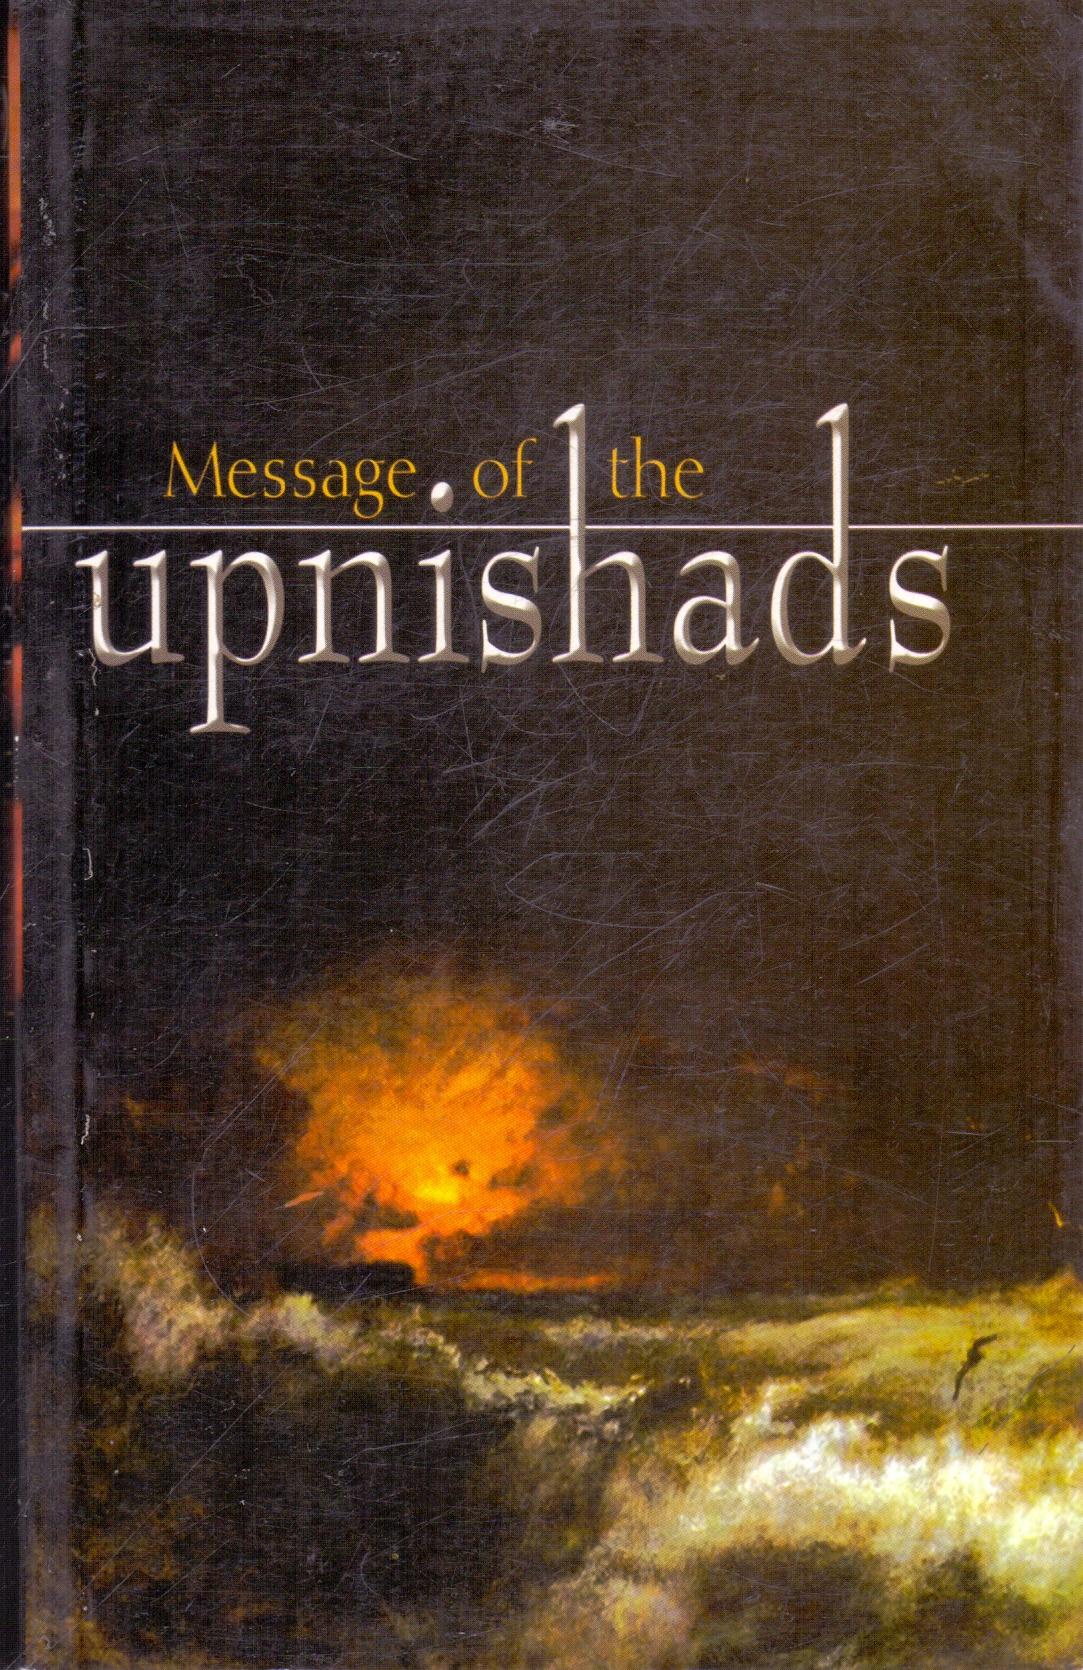 Message of the Upnishads